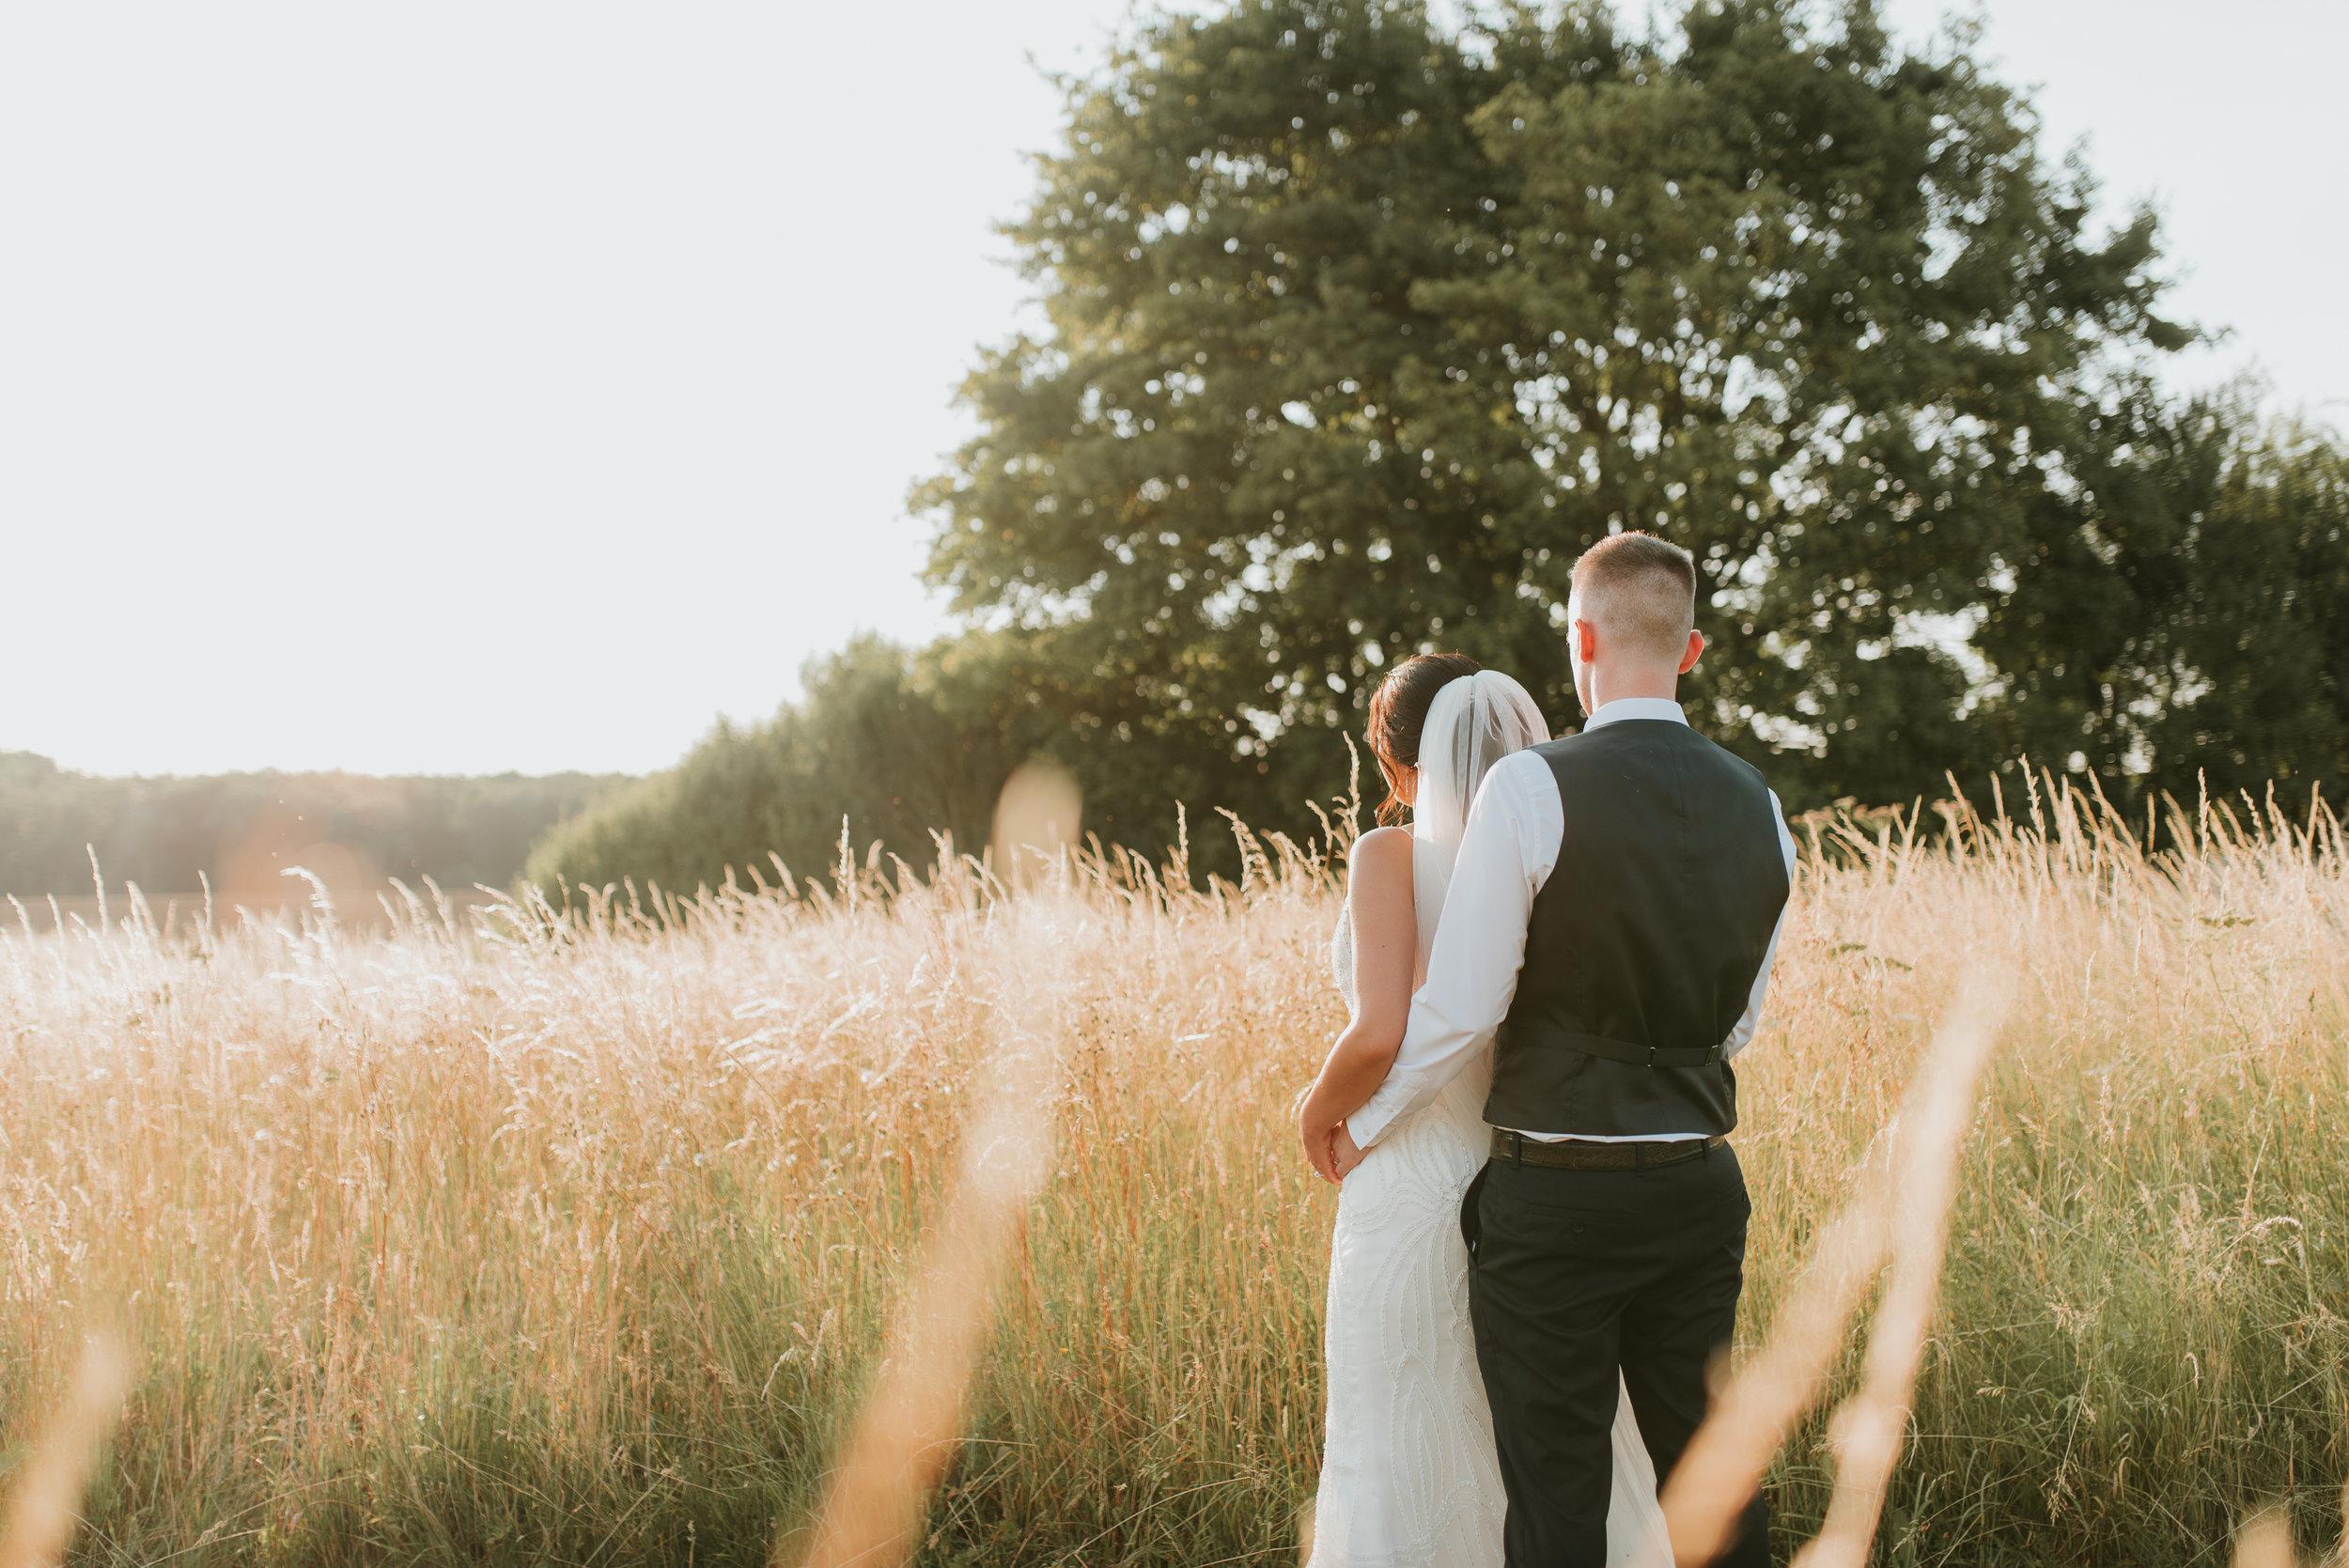 Oxfordshire-wedding-photographer-82.jpg